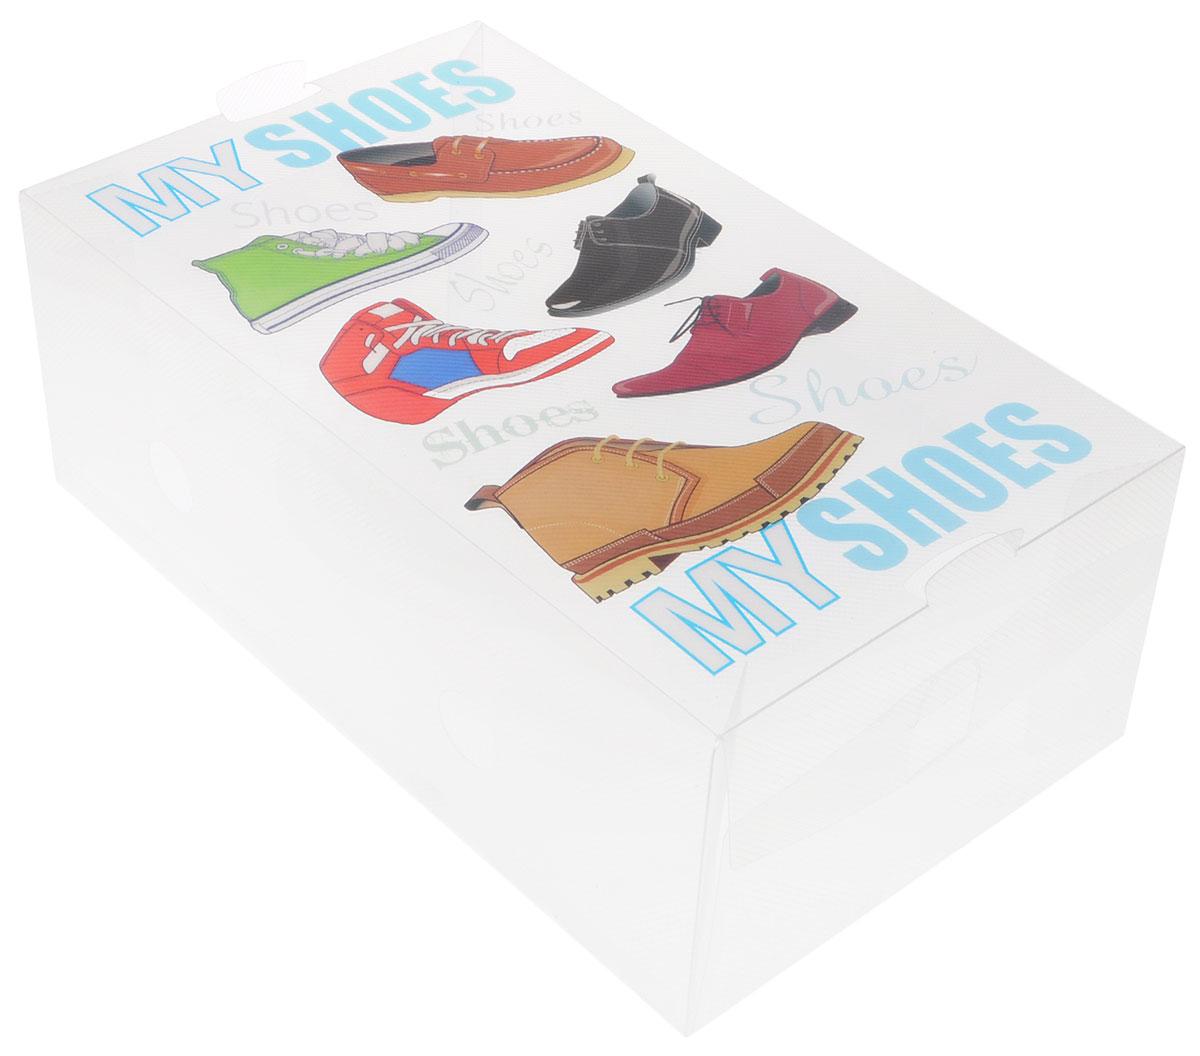 Коробка для хранения обуви Youll love, 33 х 20 х 12 см60326_рисунок 2Коробка для хранения обуви Youll love, 33 х 20 х 12 см